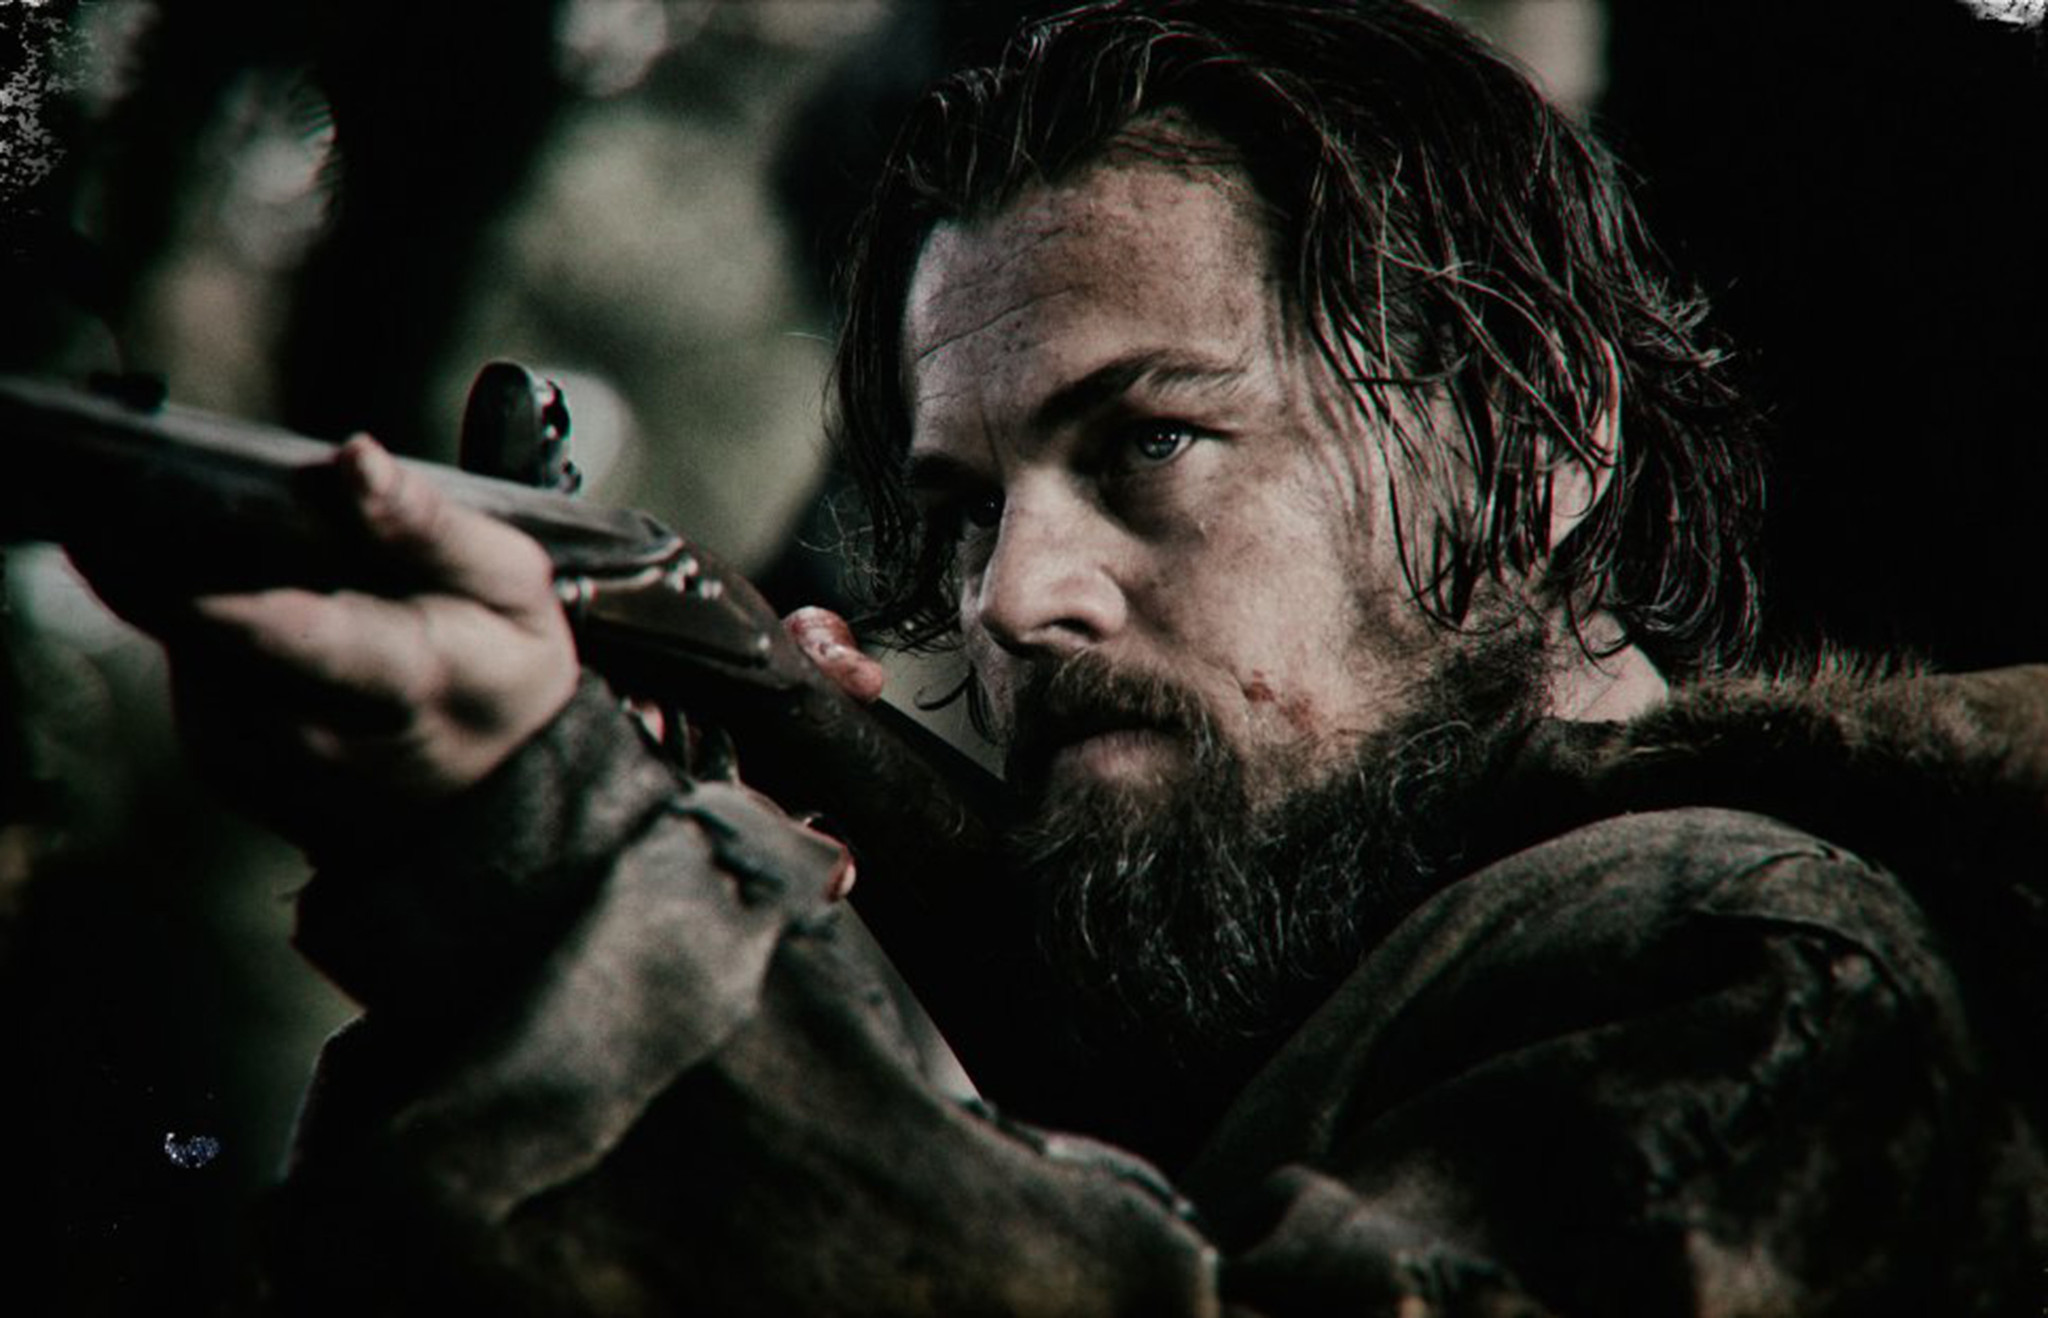 'Revenant,' 'Hateful Eight' screeners leak before theatrical release